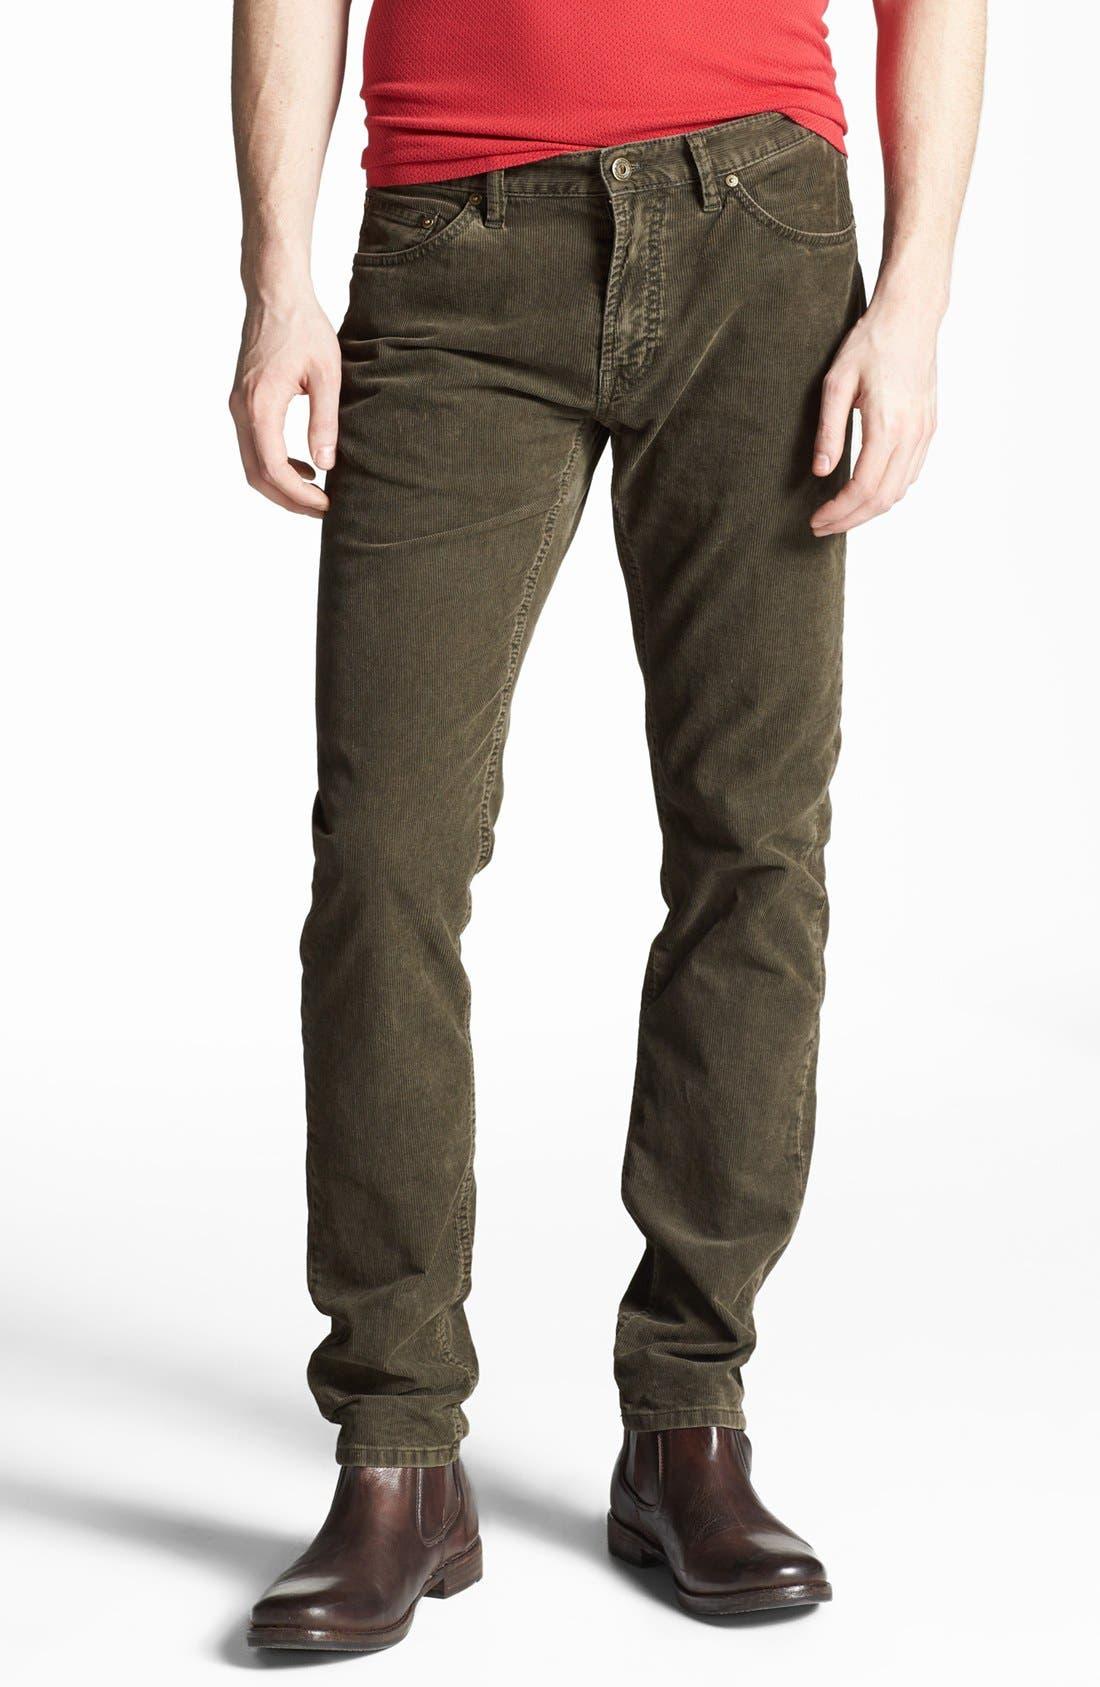 Alternate Image 1 Selected - Gant by Michael Bastian Slim Straight Leg Corduroy Pants